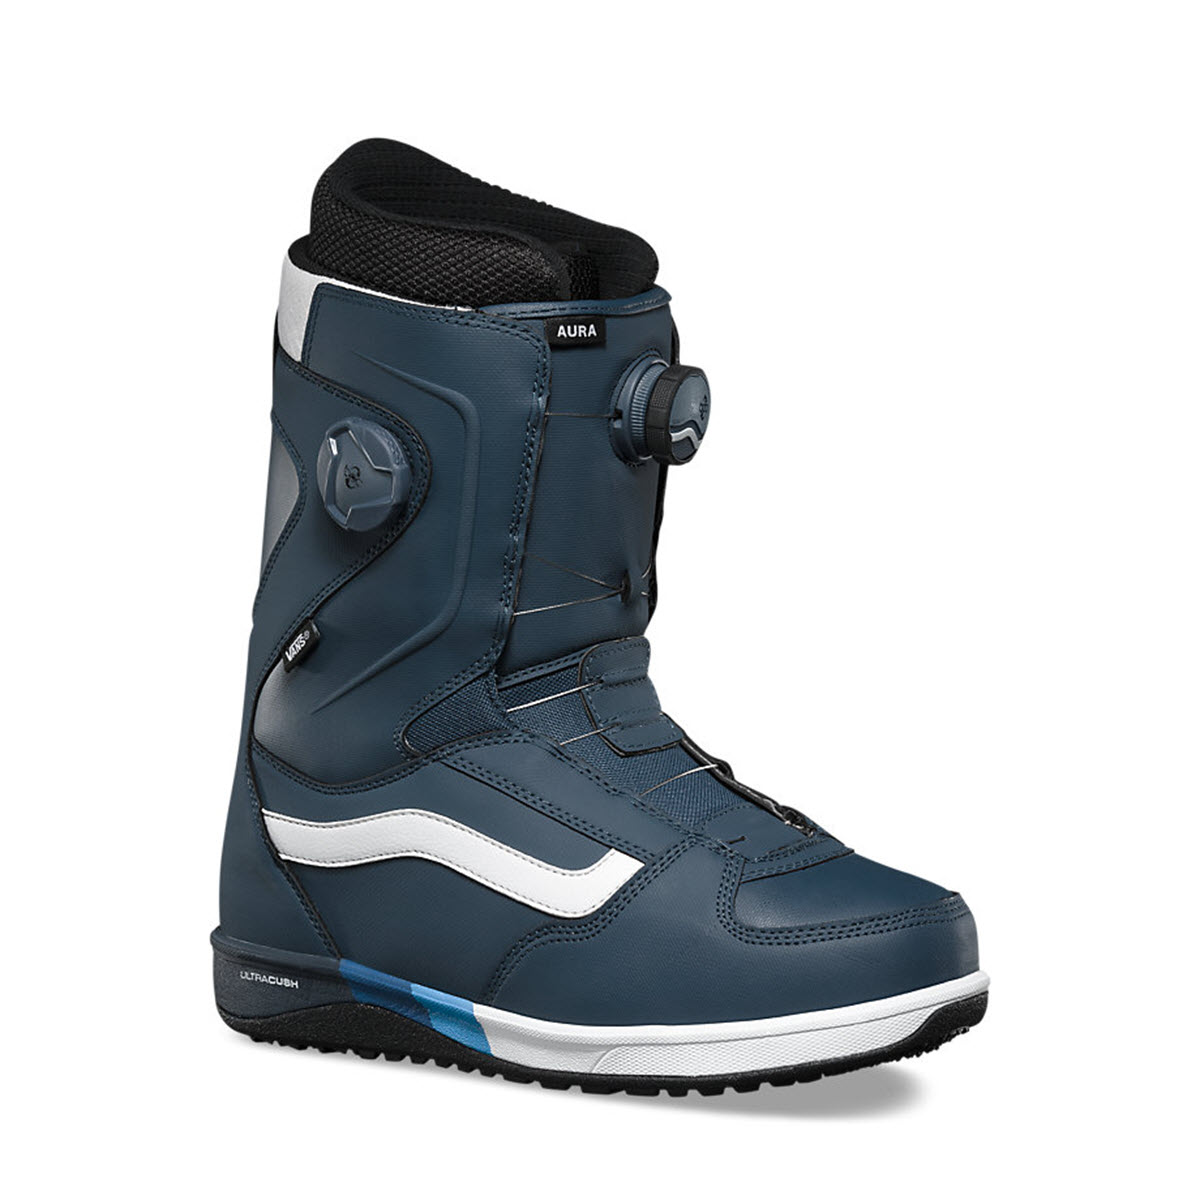 Vans Aura Snowboard Boots review